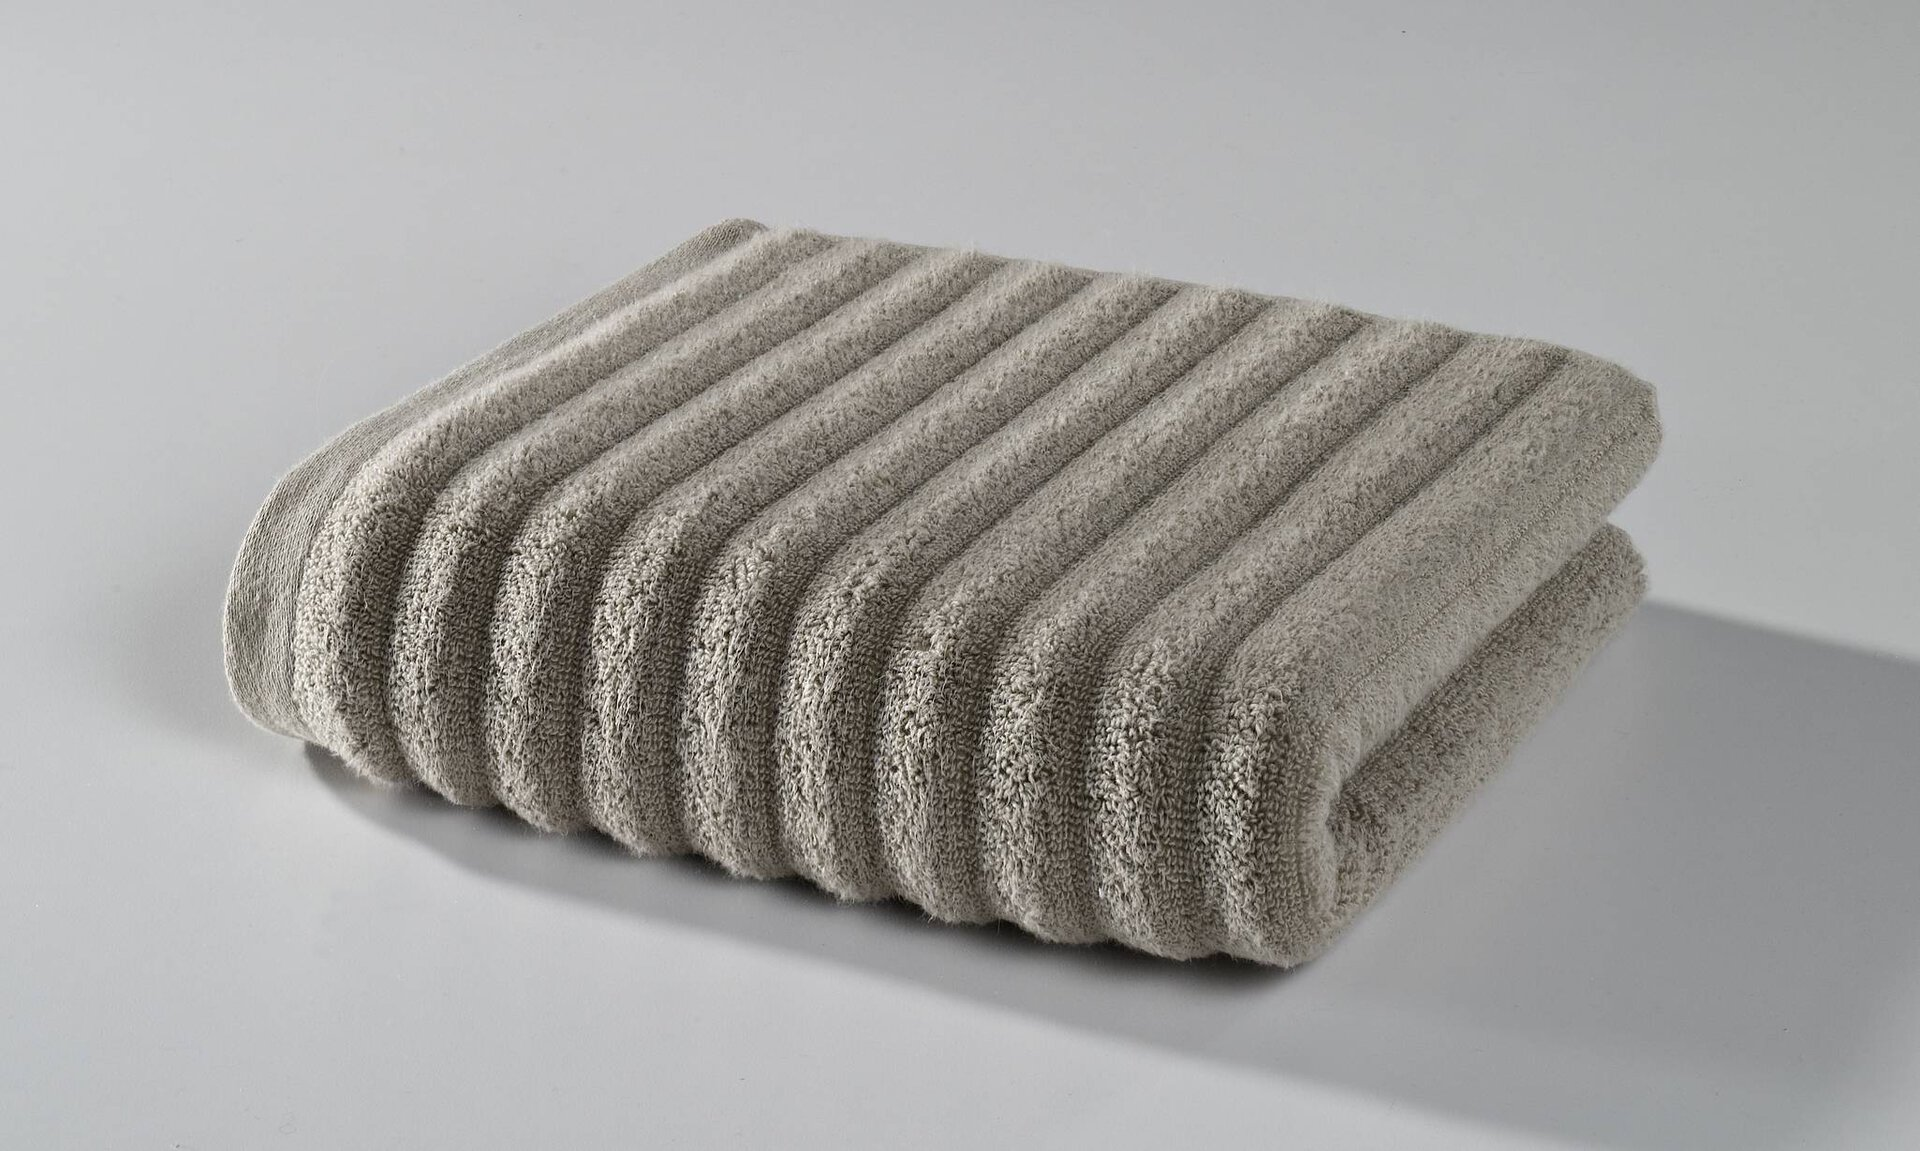 Handtuch Enjoy Kenborg Textil beige 50 x 100 cm